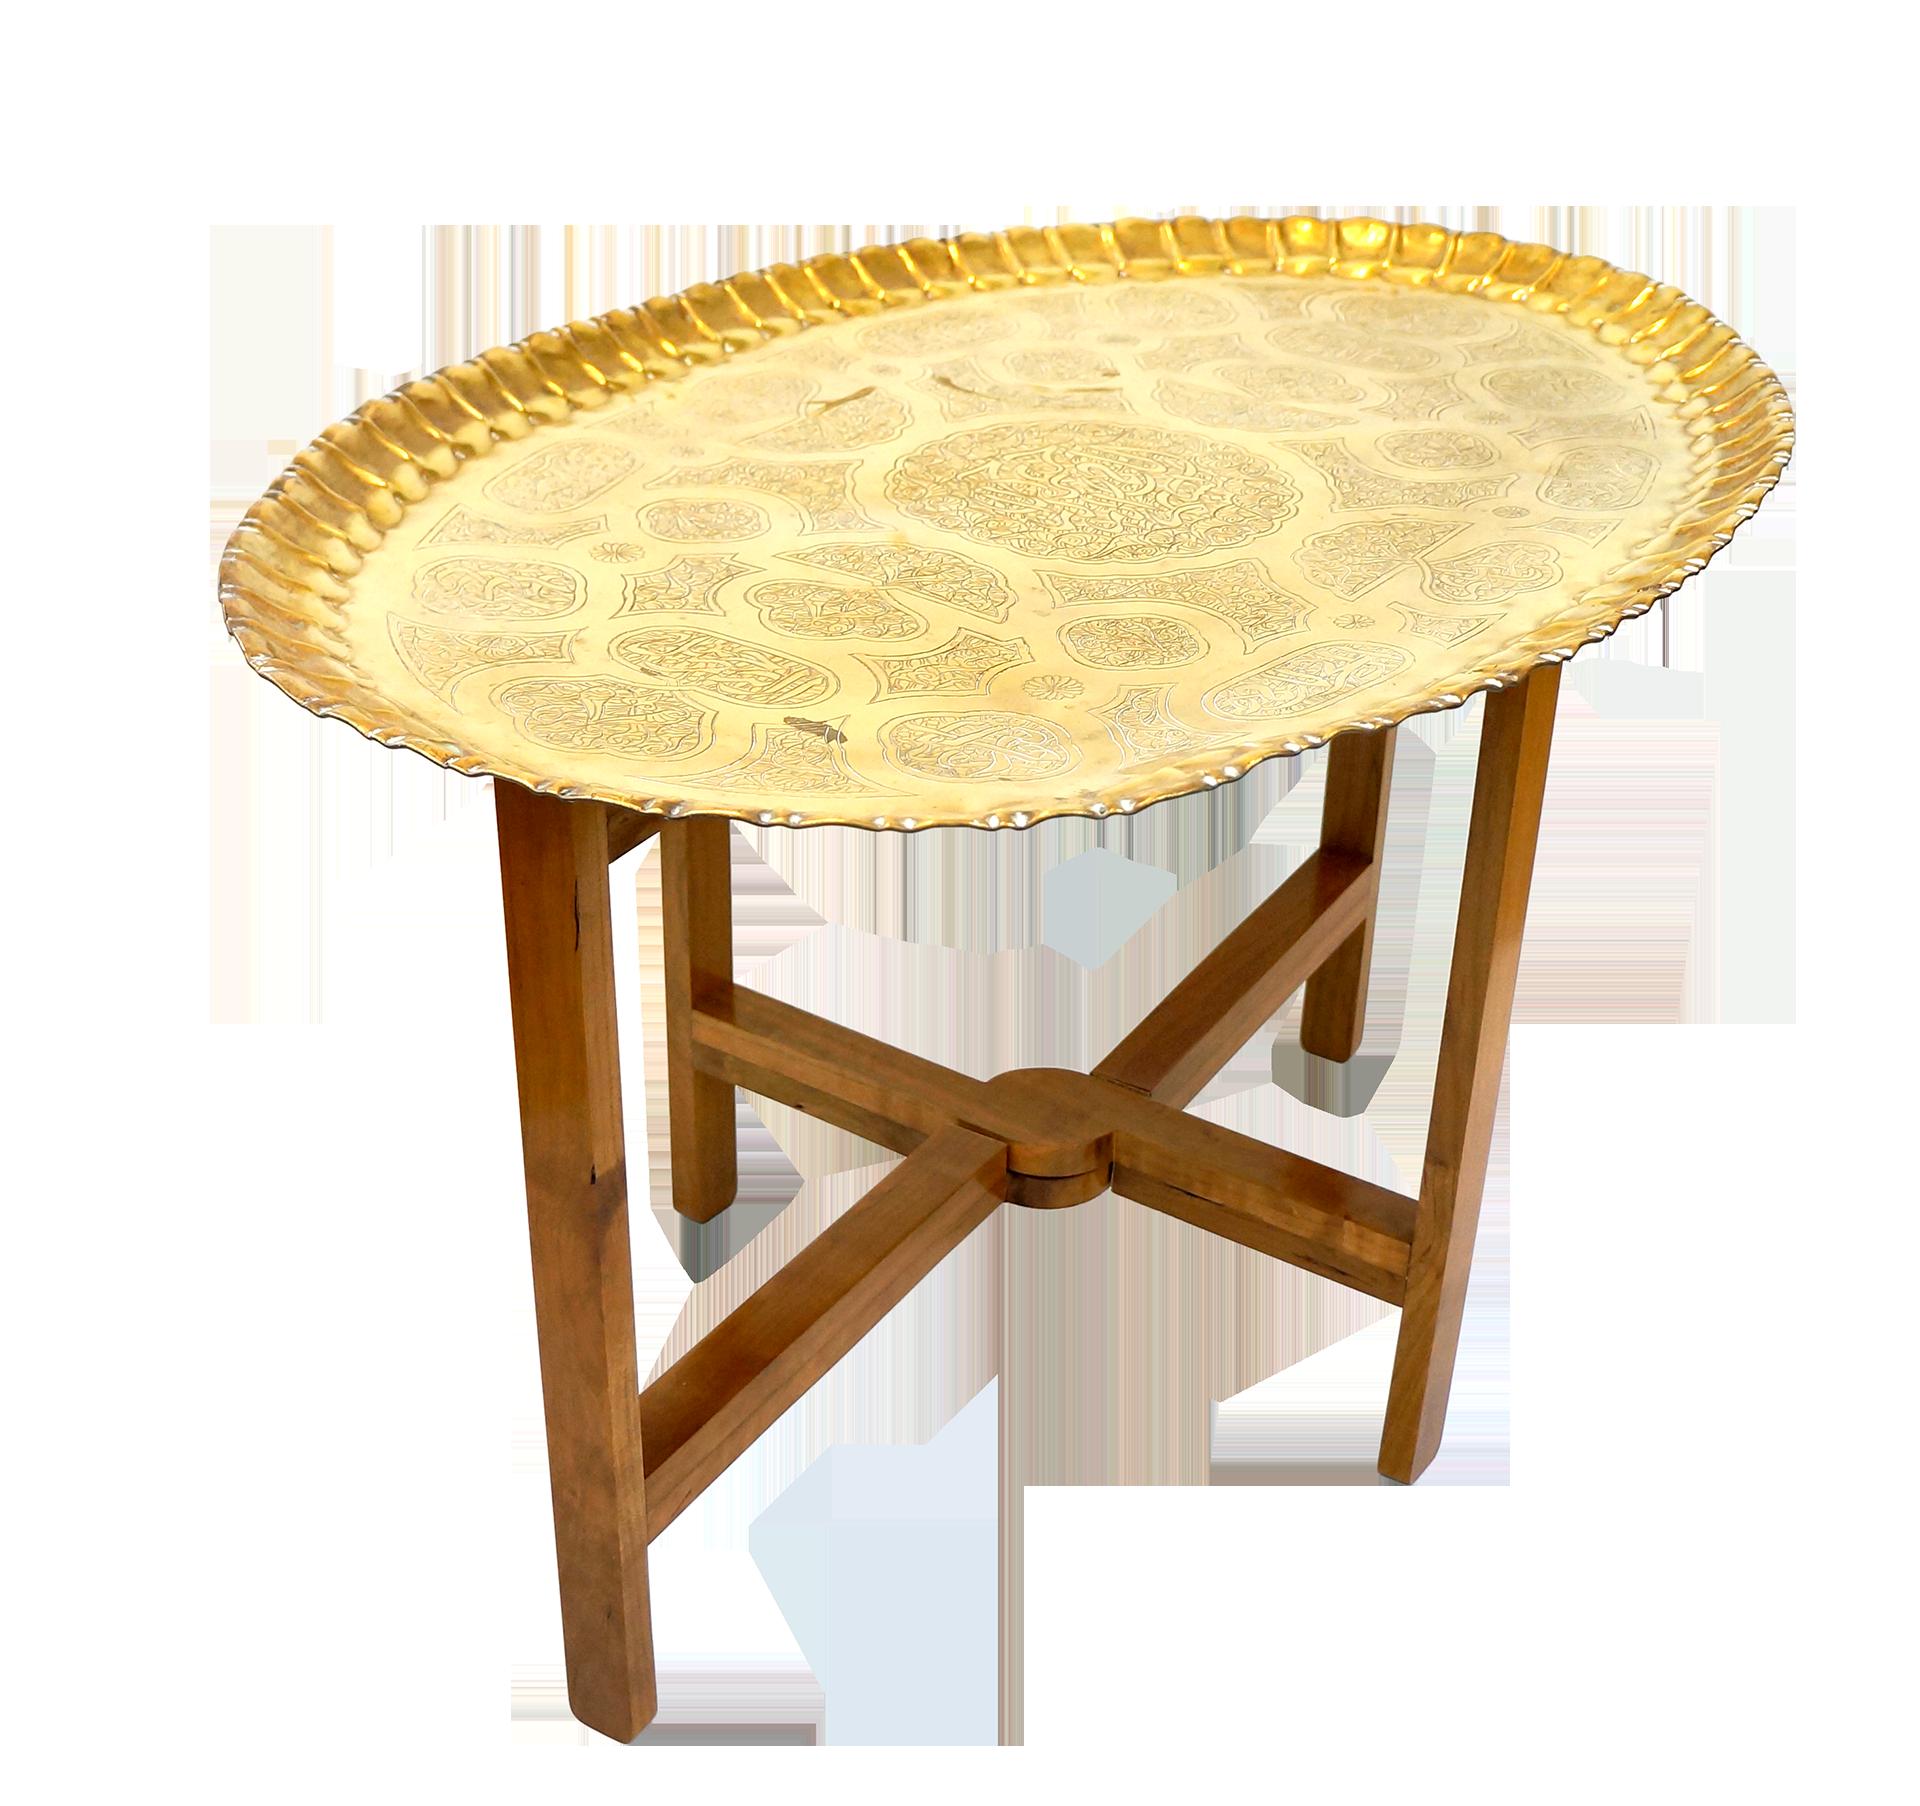 Folding table base 1.png